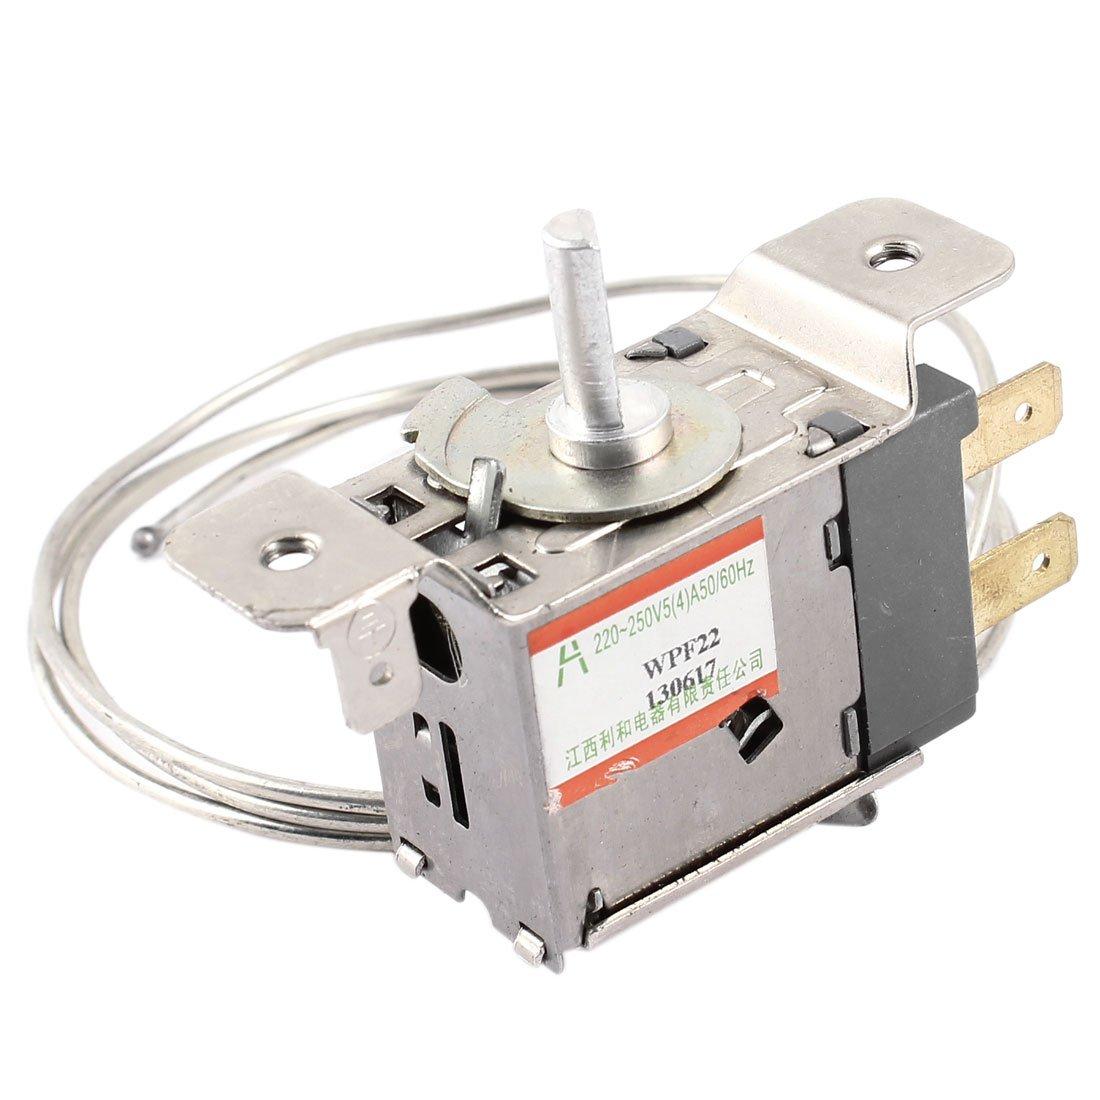 Ca 220 –  250 V 5 A Metal 2 pin nevera termostato de control de temperatura Sourcingmap SYNCE011739